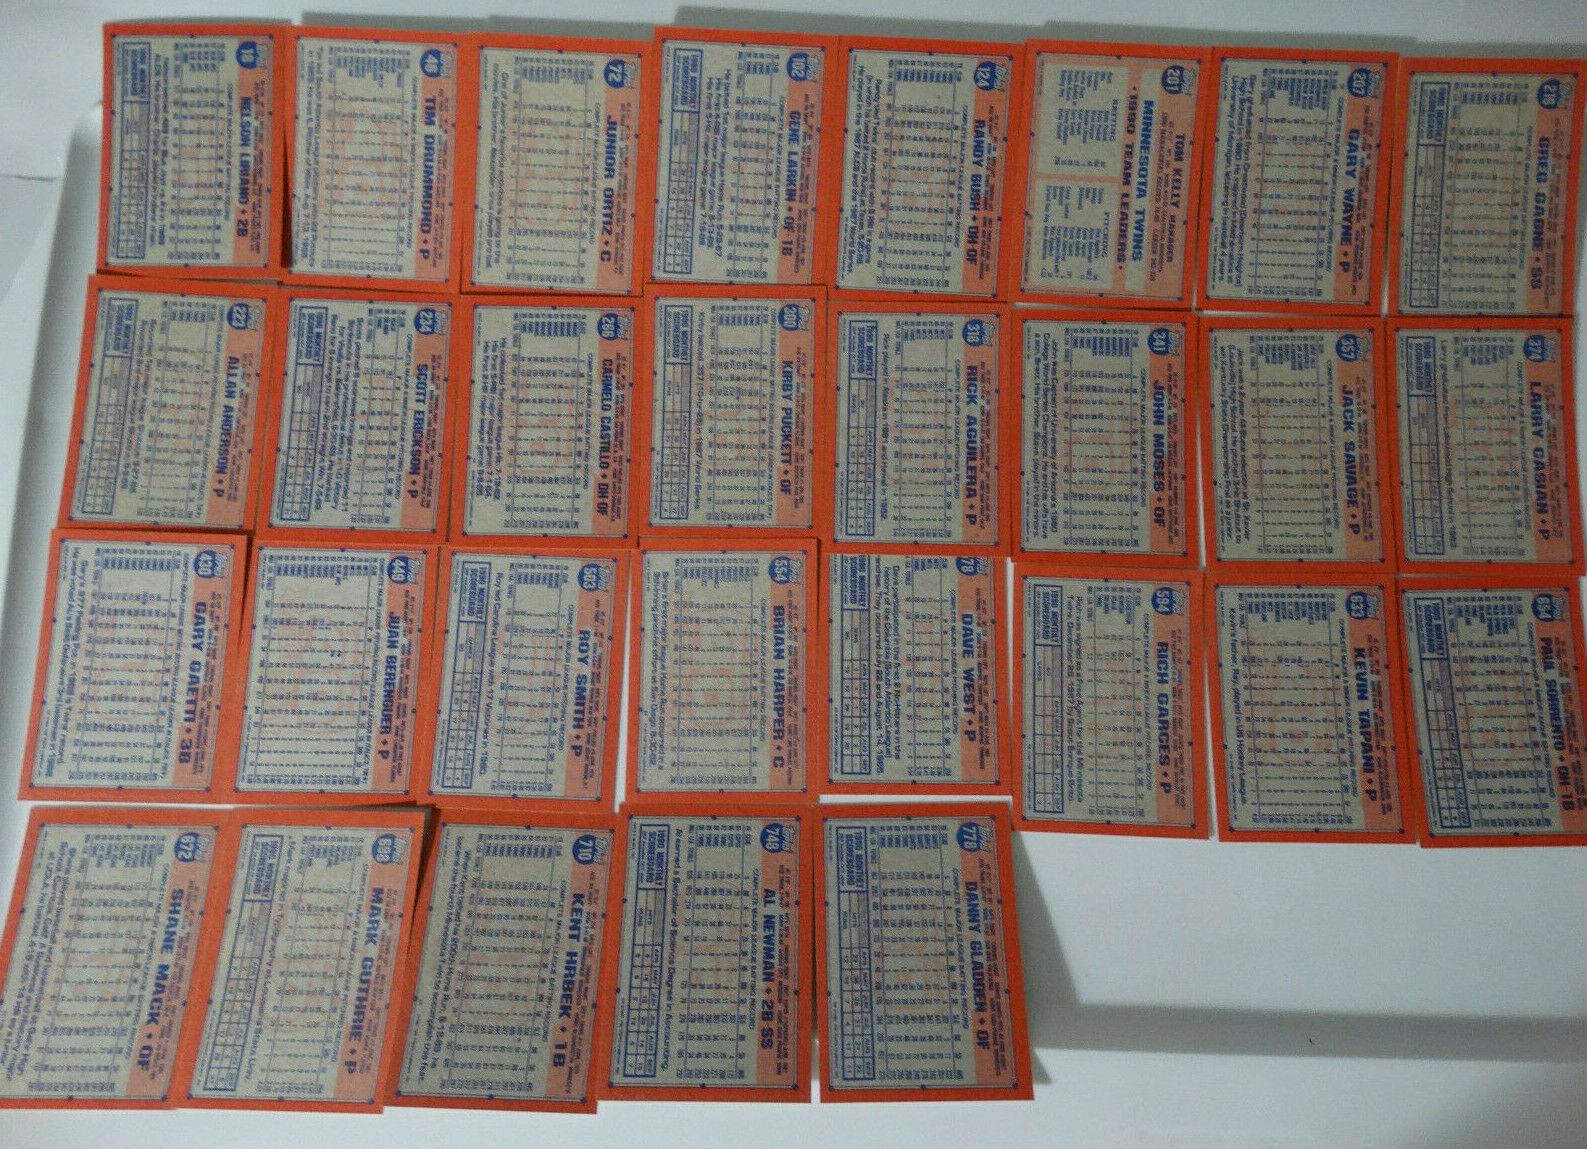 1991 Topps Minnesota Twins Team Set of 29 Baseball Cards image 2